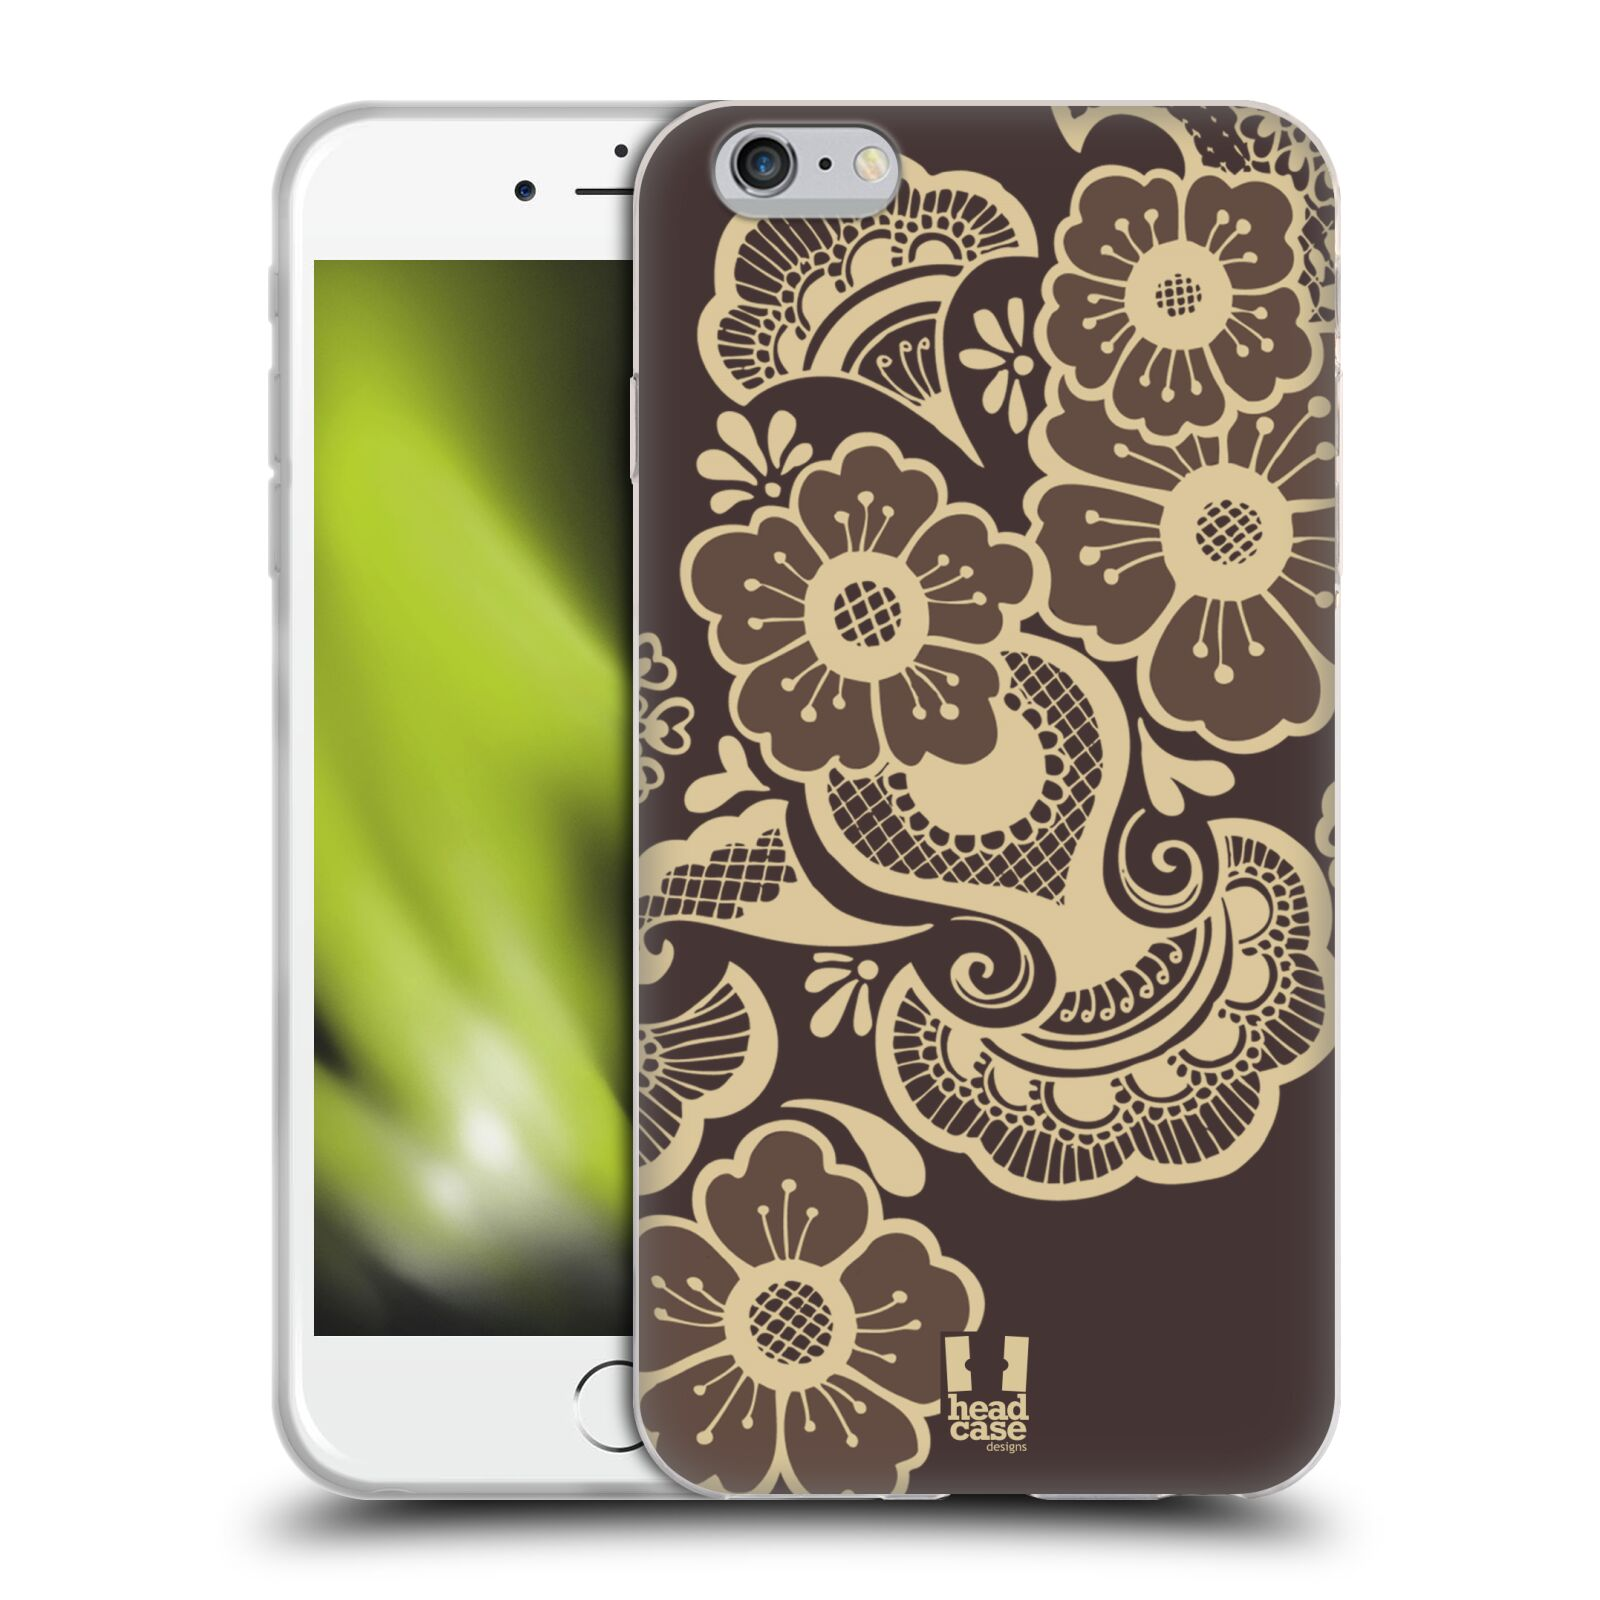 HEAD CASE silikonový obal na mobil Apple Iphone 6 PLUS/ 6S PLUS vzor Hena tetování KRAJKA